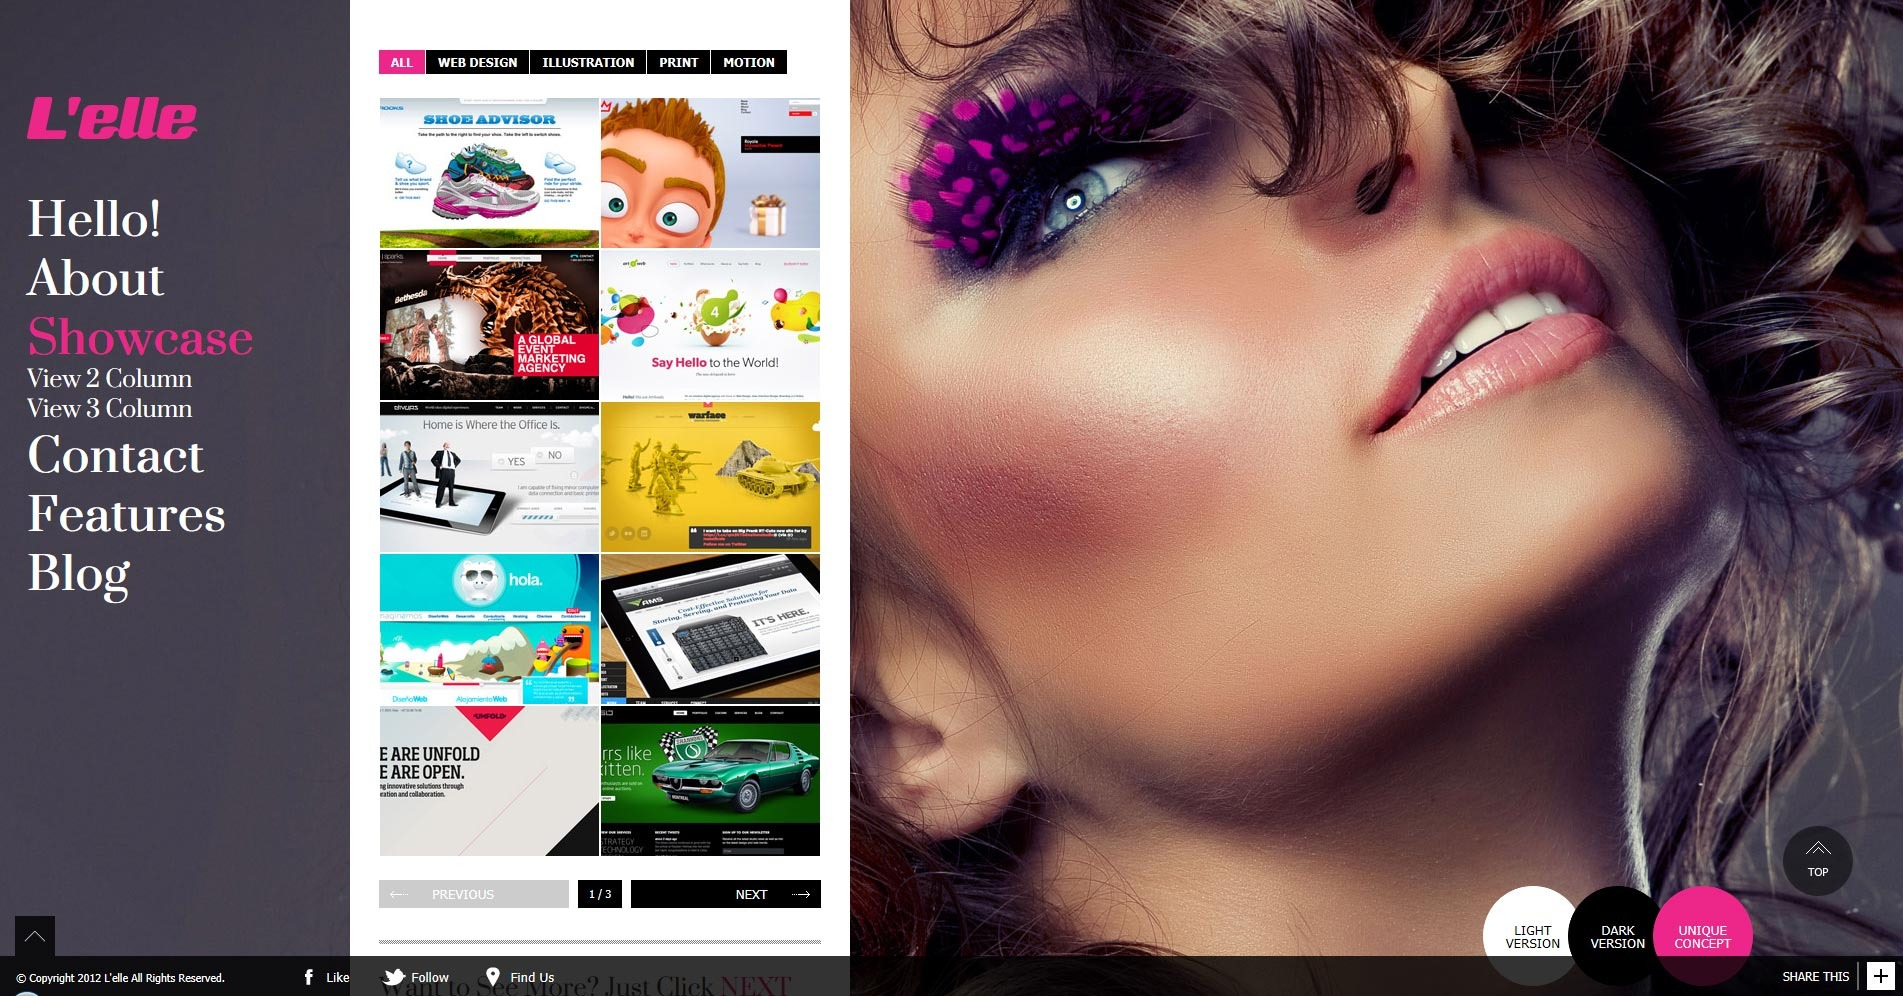 L'elle Creative Agency Showcase - showcase 2column overall view